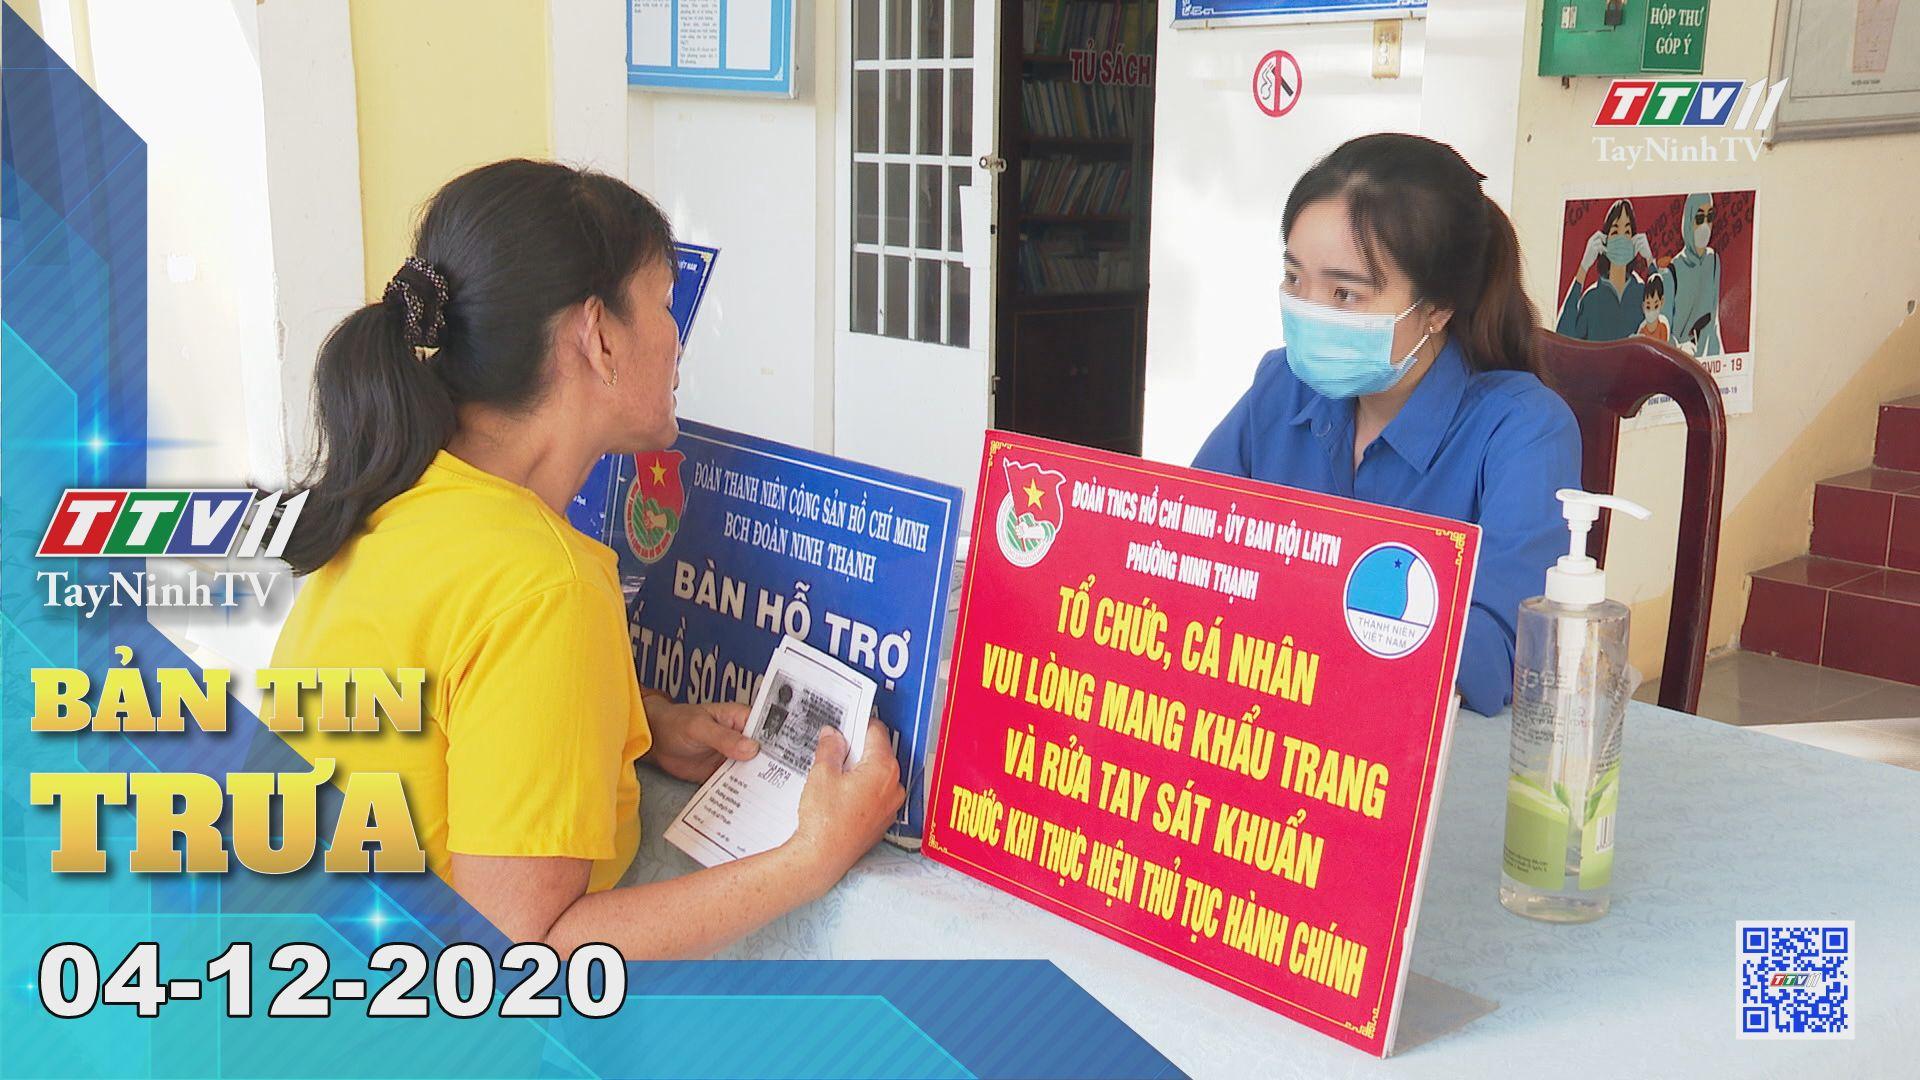 Bản tin trưa 04-12-2020 | Tin tức hôm nay | TayNinhTV